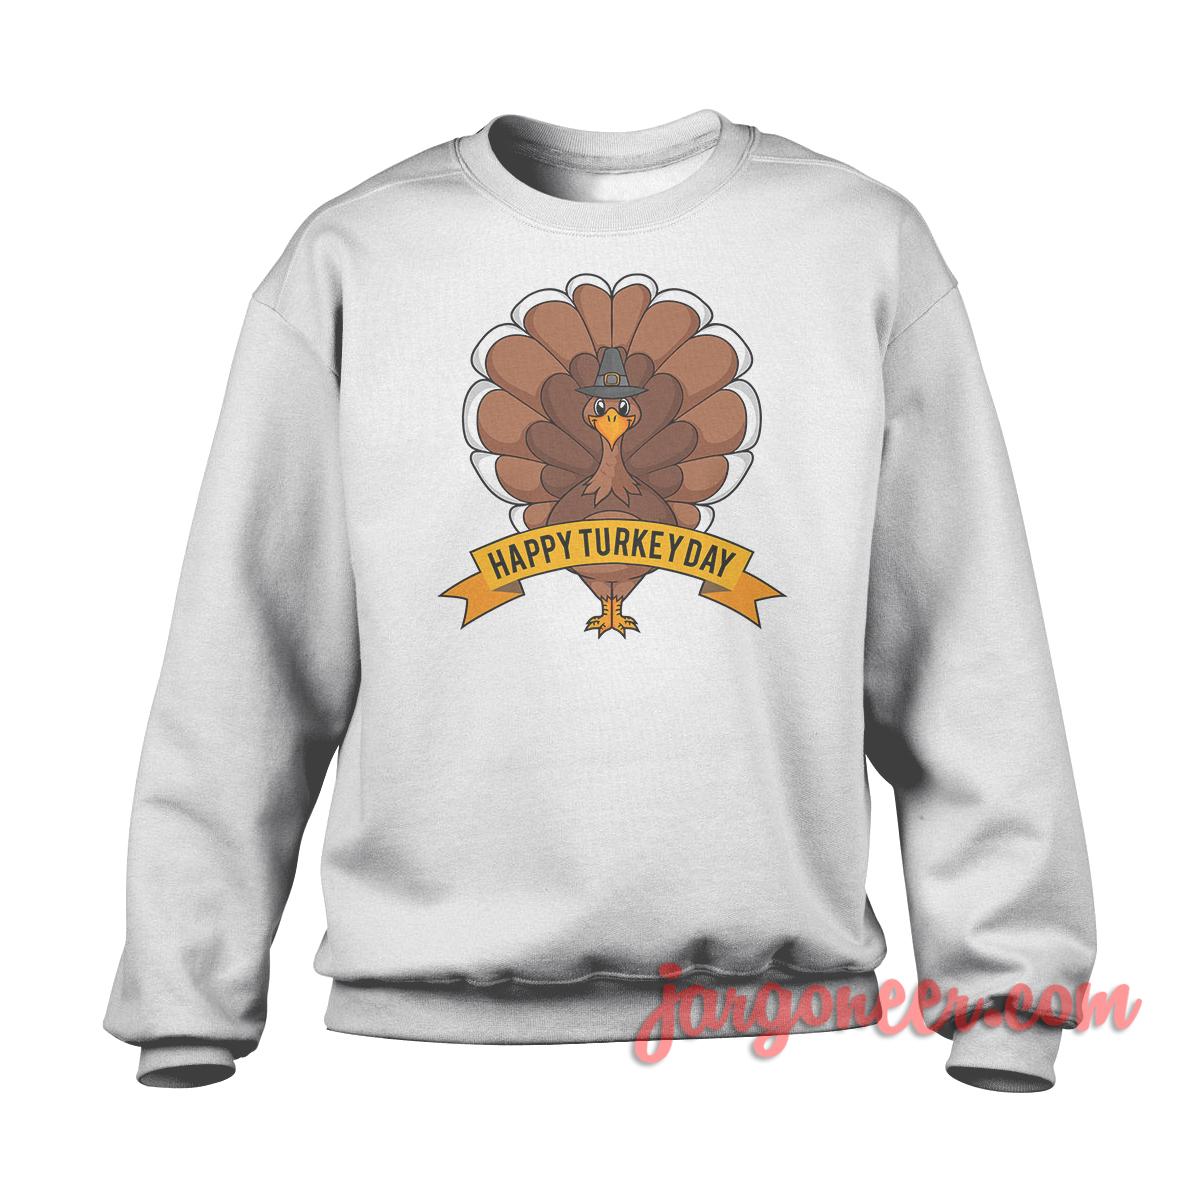 Female T Shirt Design Ideas